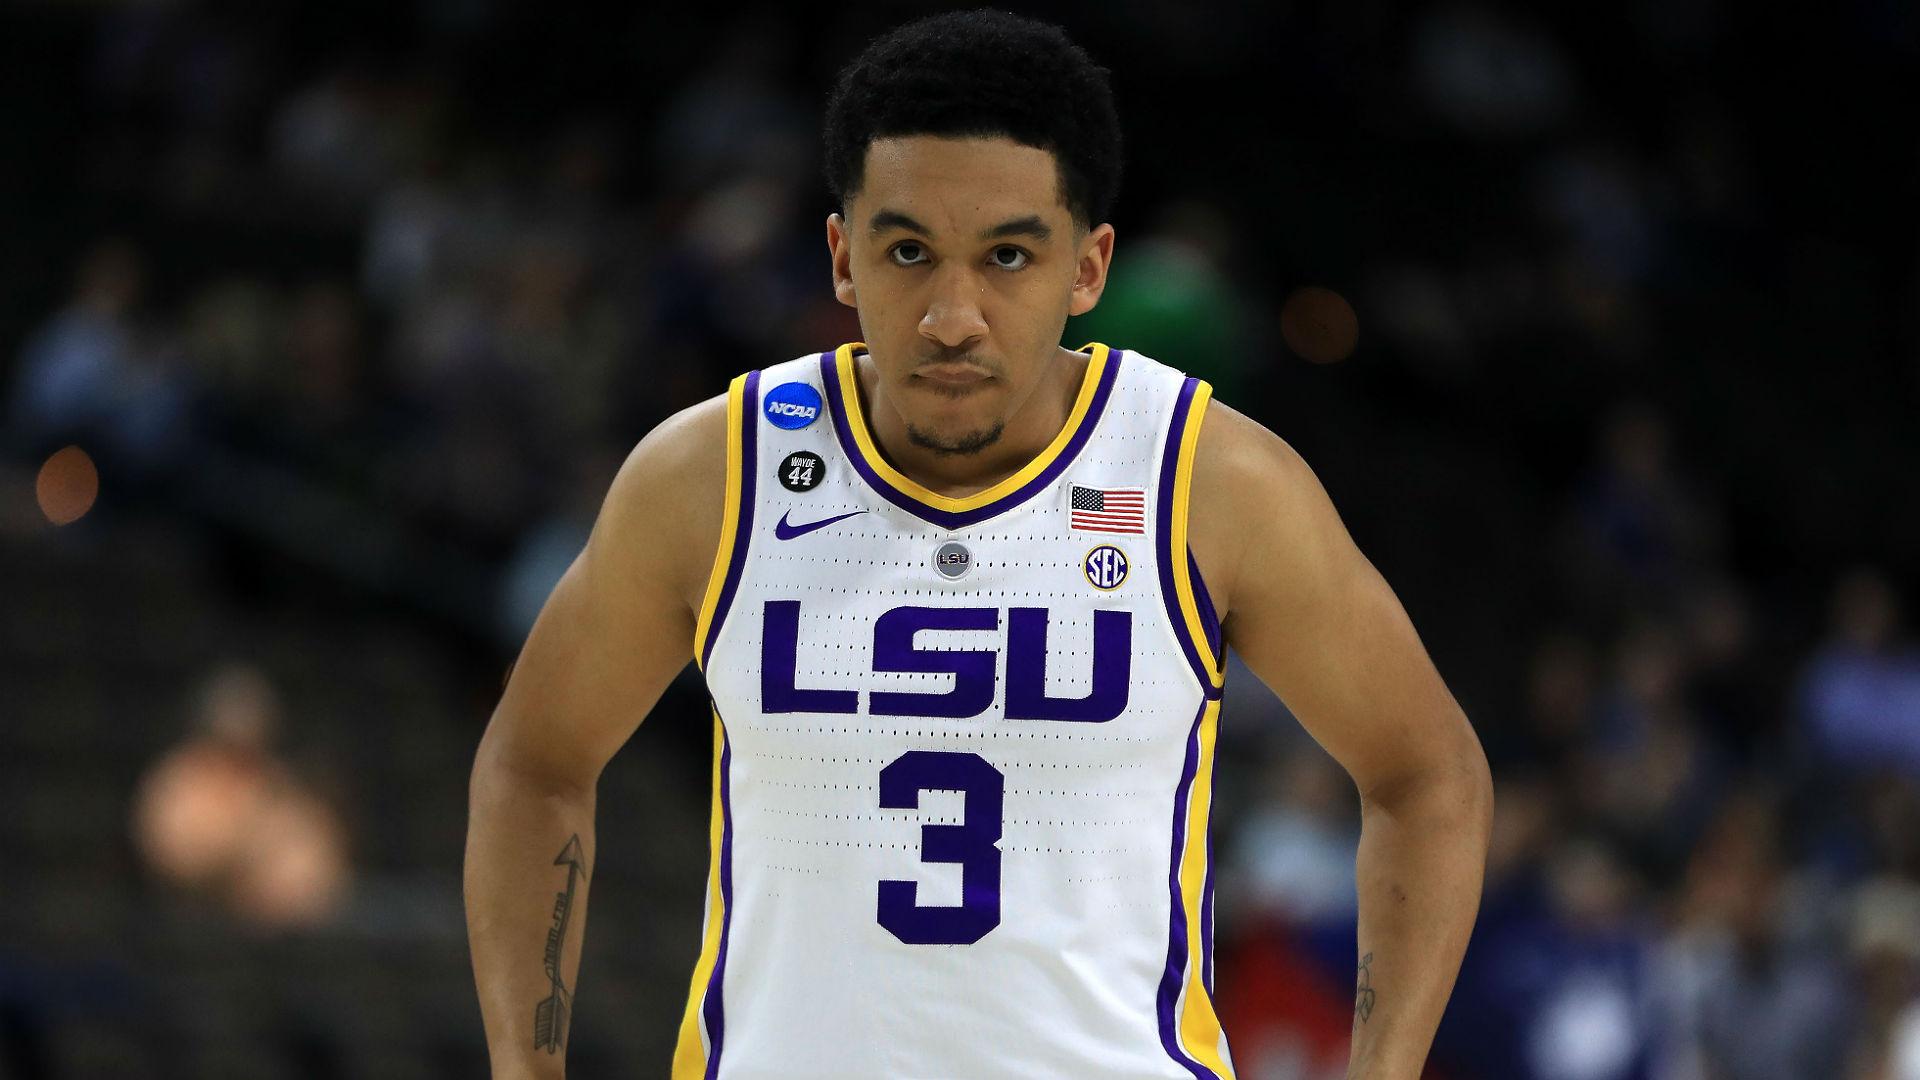 NBA Draft 2019: 5 second-round sleepers